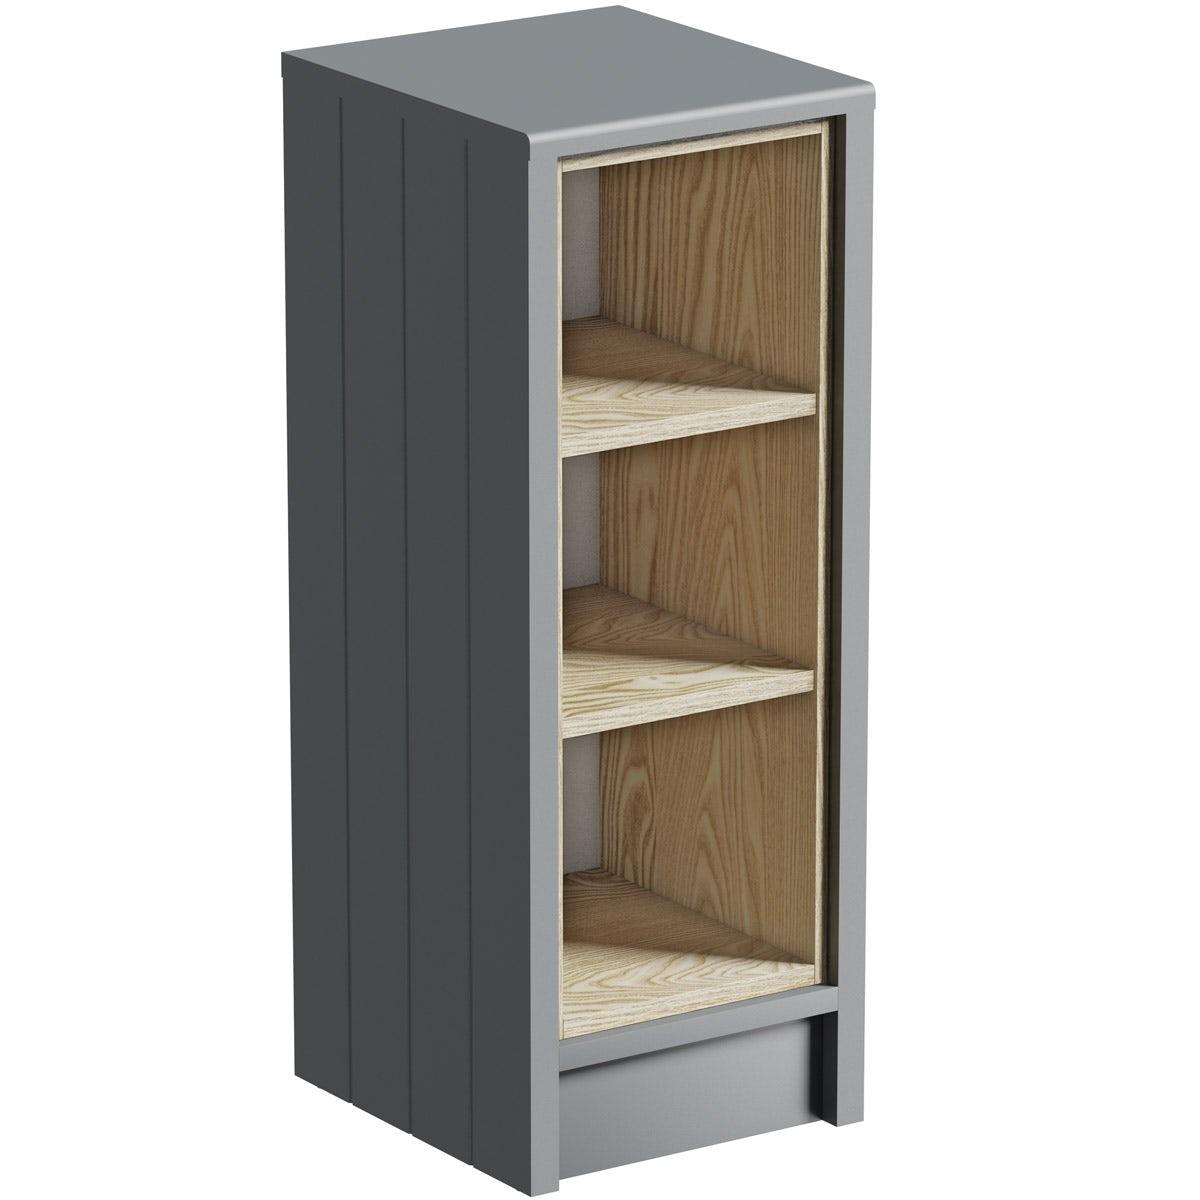 The Bath Co. Dulwich stone grey open storage unit